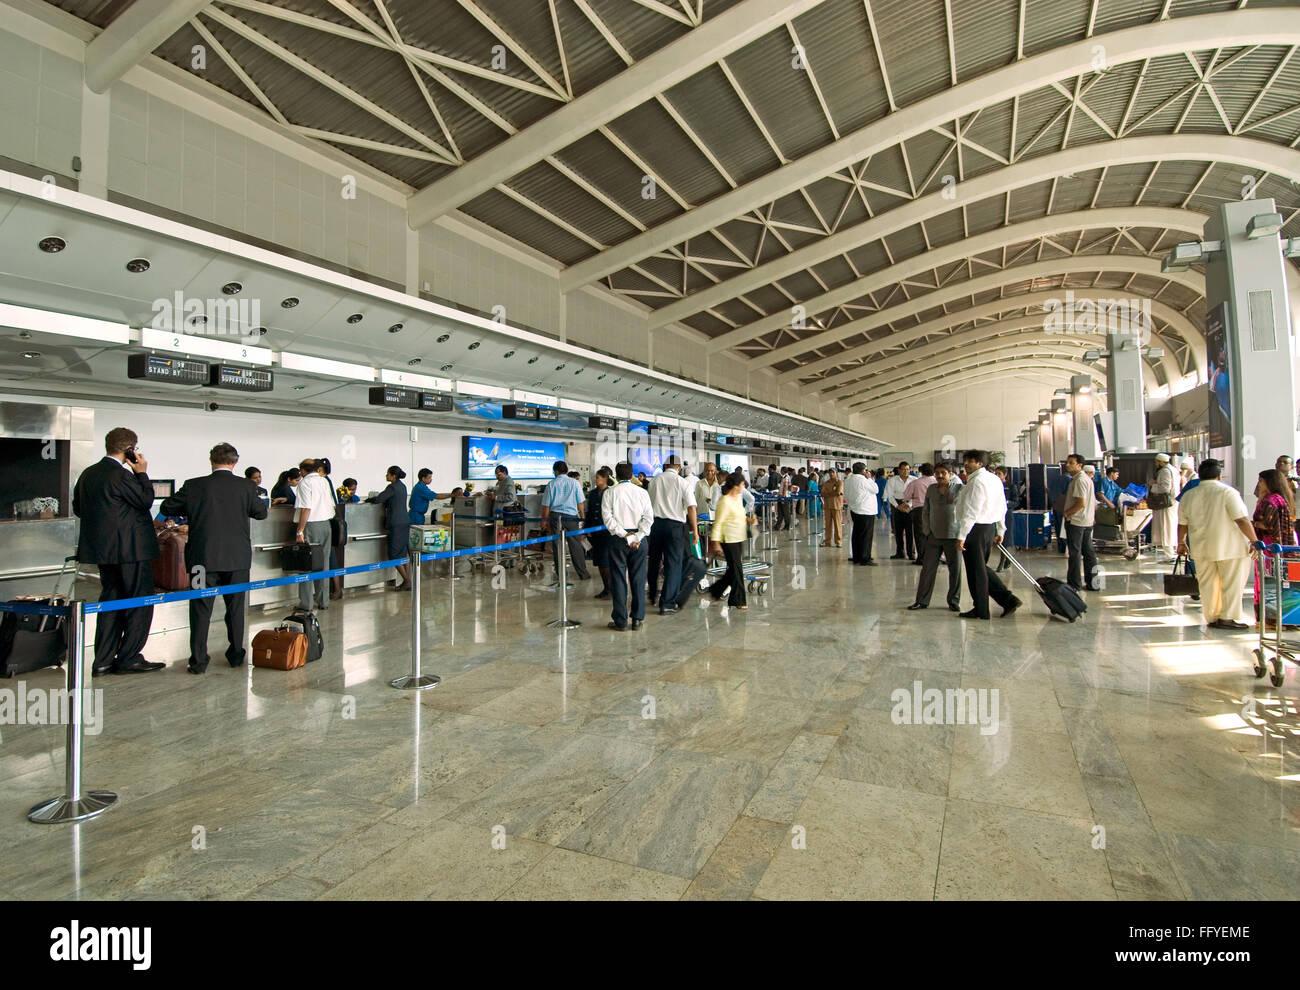 Check in counters at chhatrapati shivaji international airport ; Santacruz ; Bombay Mumbai ; Maharashtra ; India - Stock Image